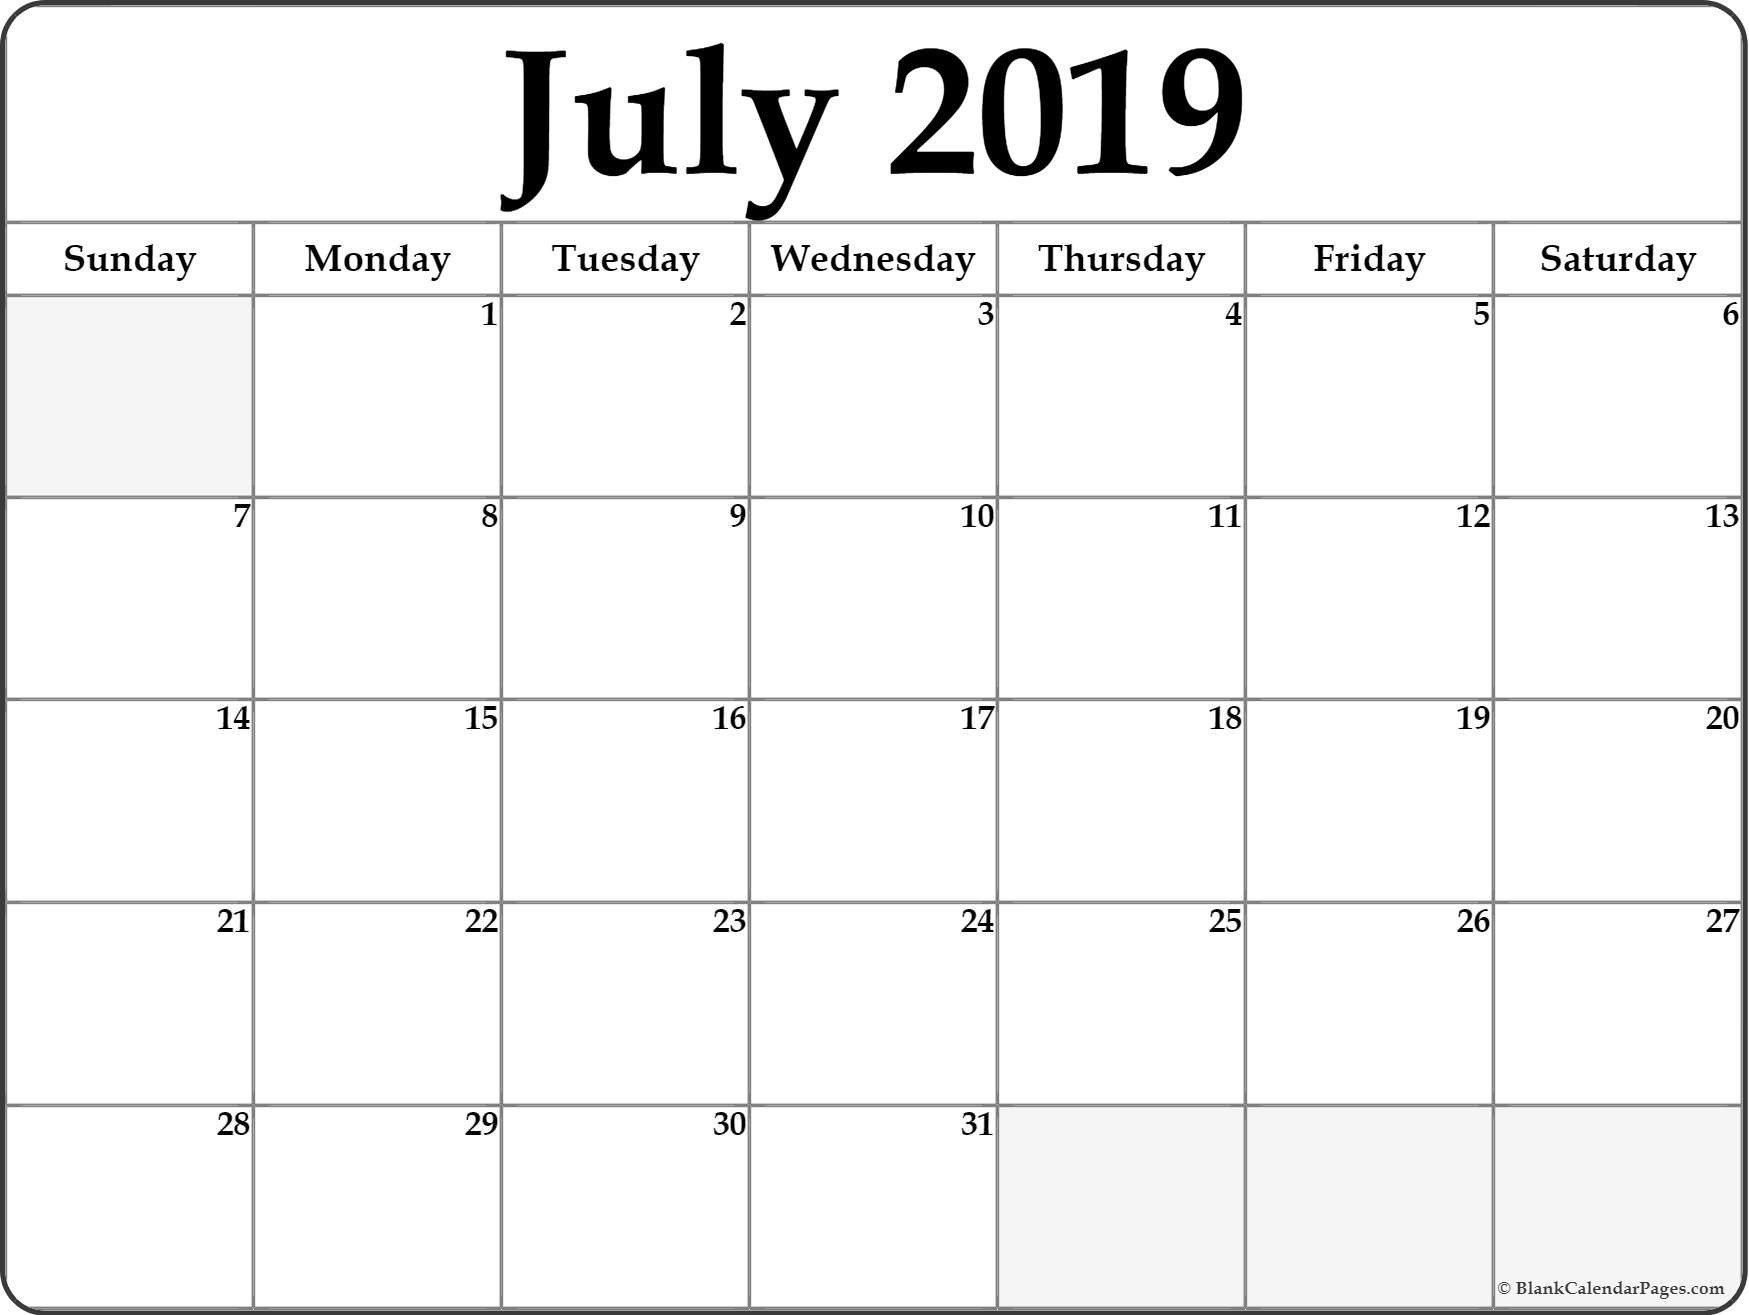 2019 July Printable Calendar - Icard.cmi-C Calendar 2019 Monthly